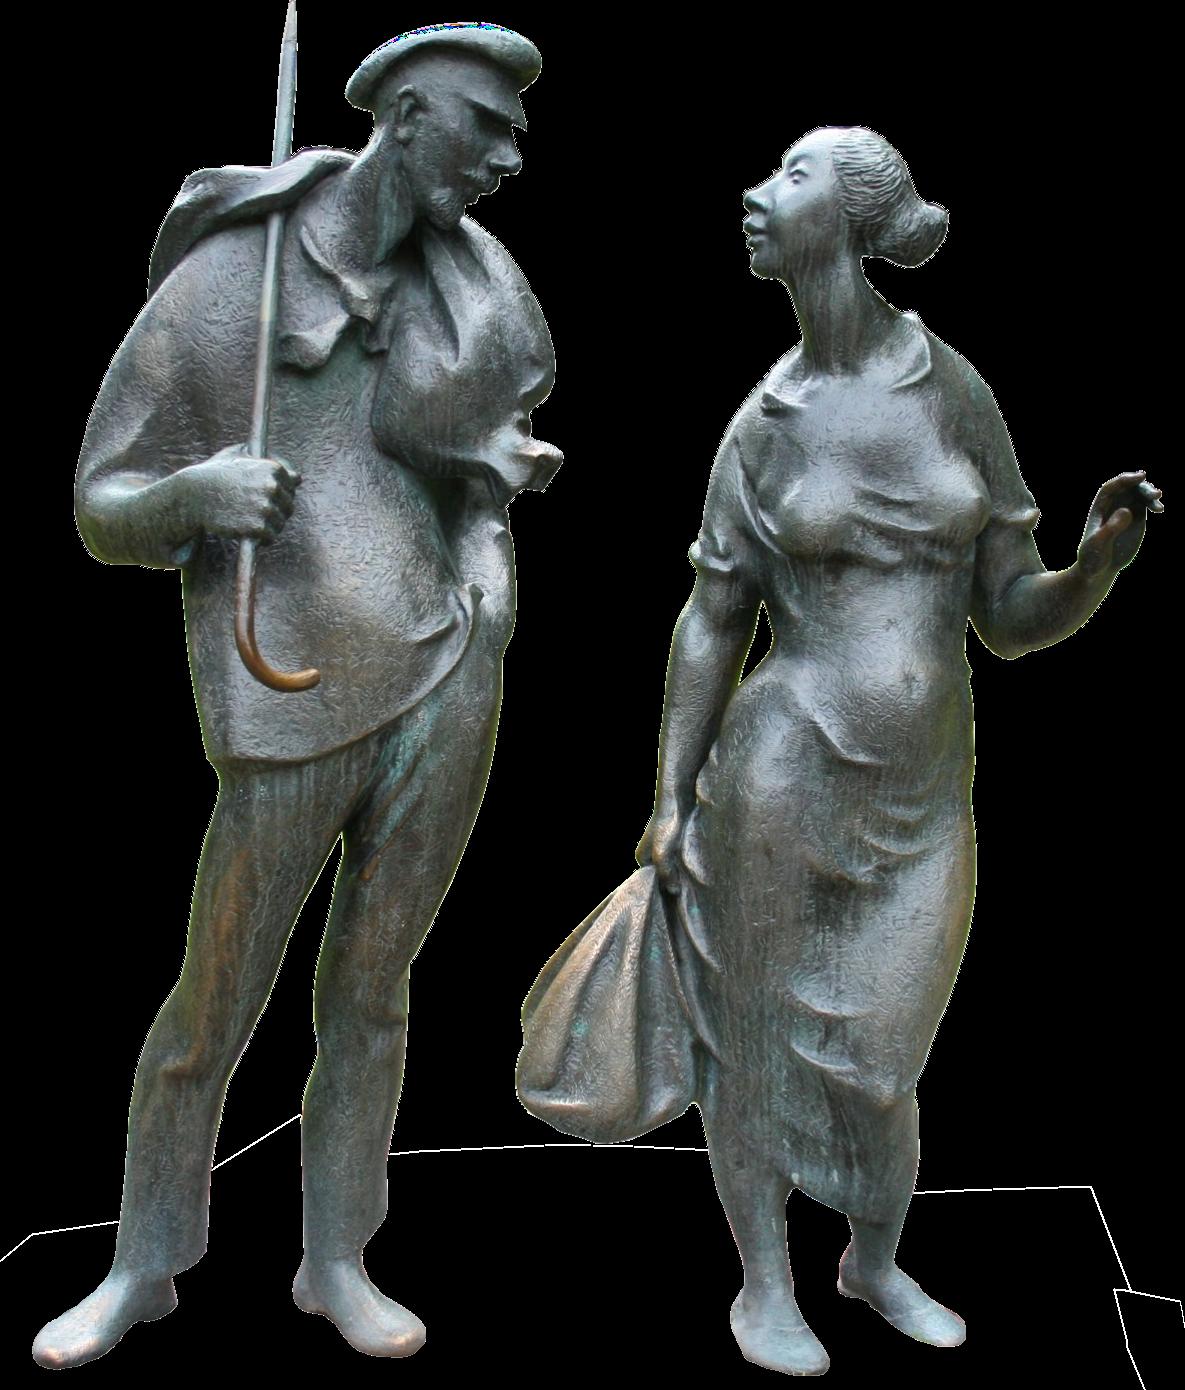 Bandwirker-Denkmal